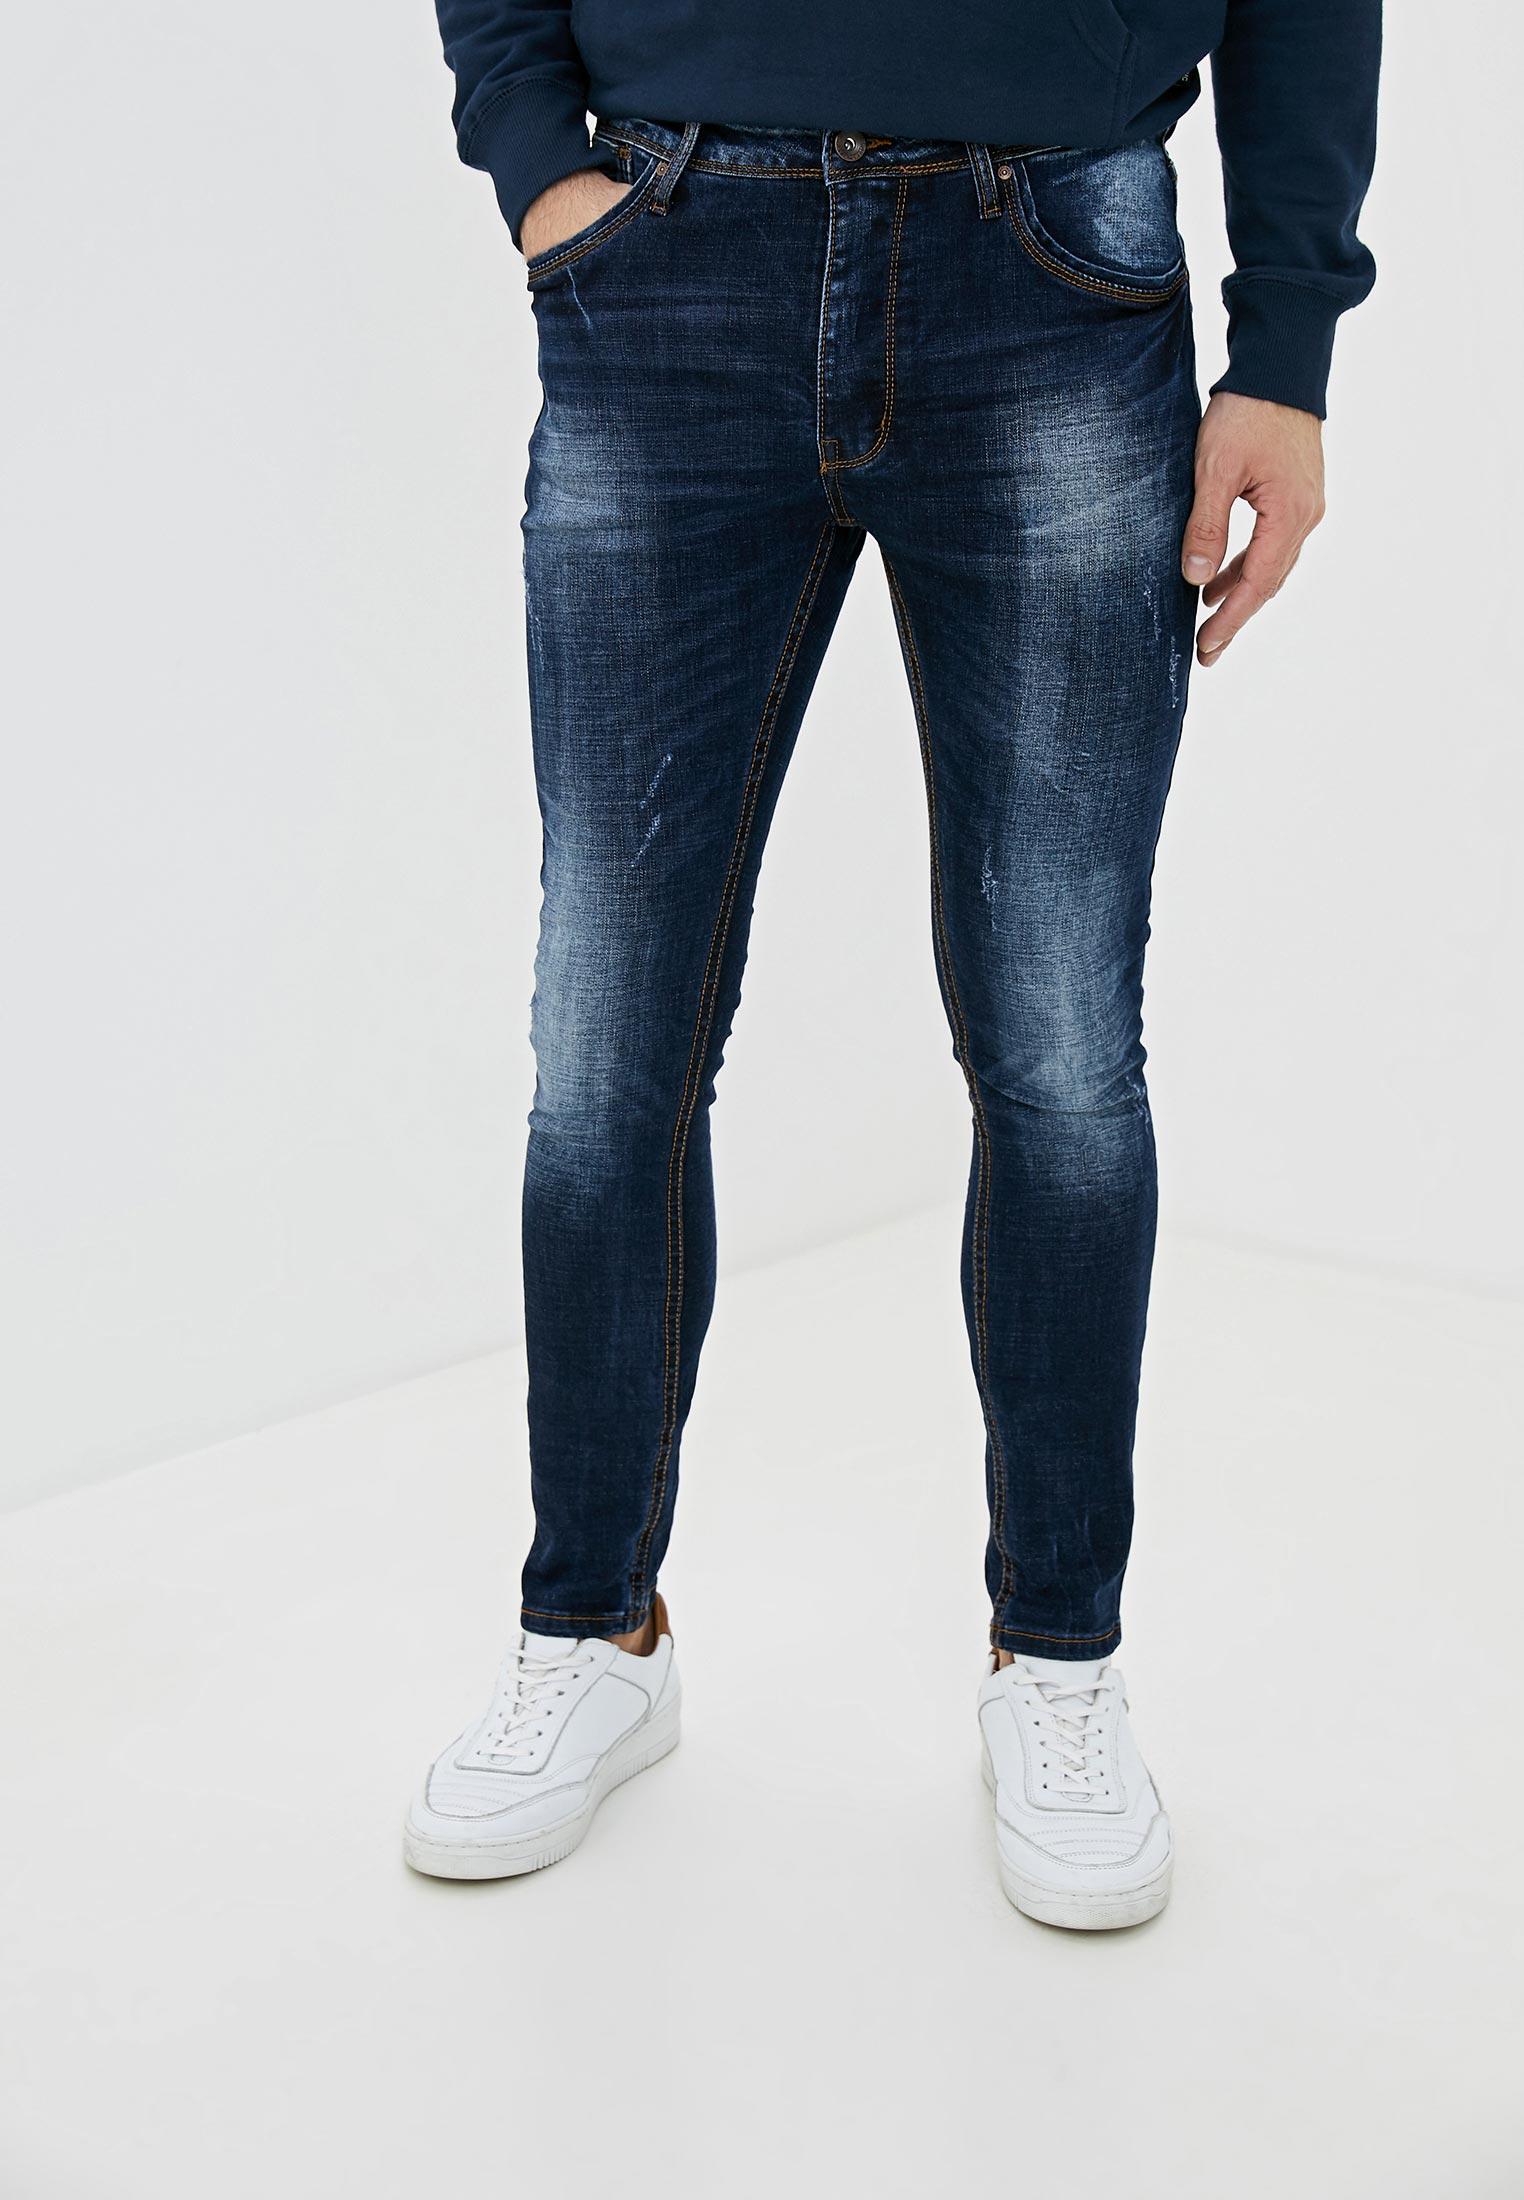 Зауженные джинсы Terance Kole 66070